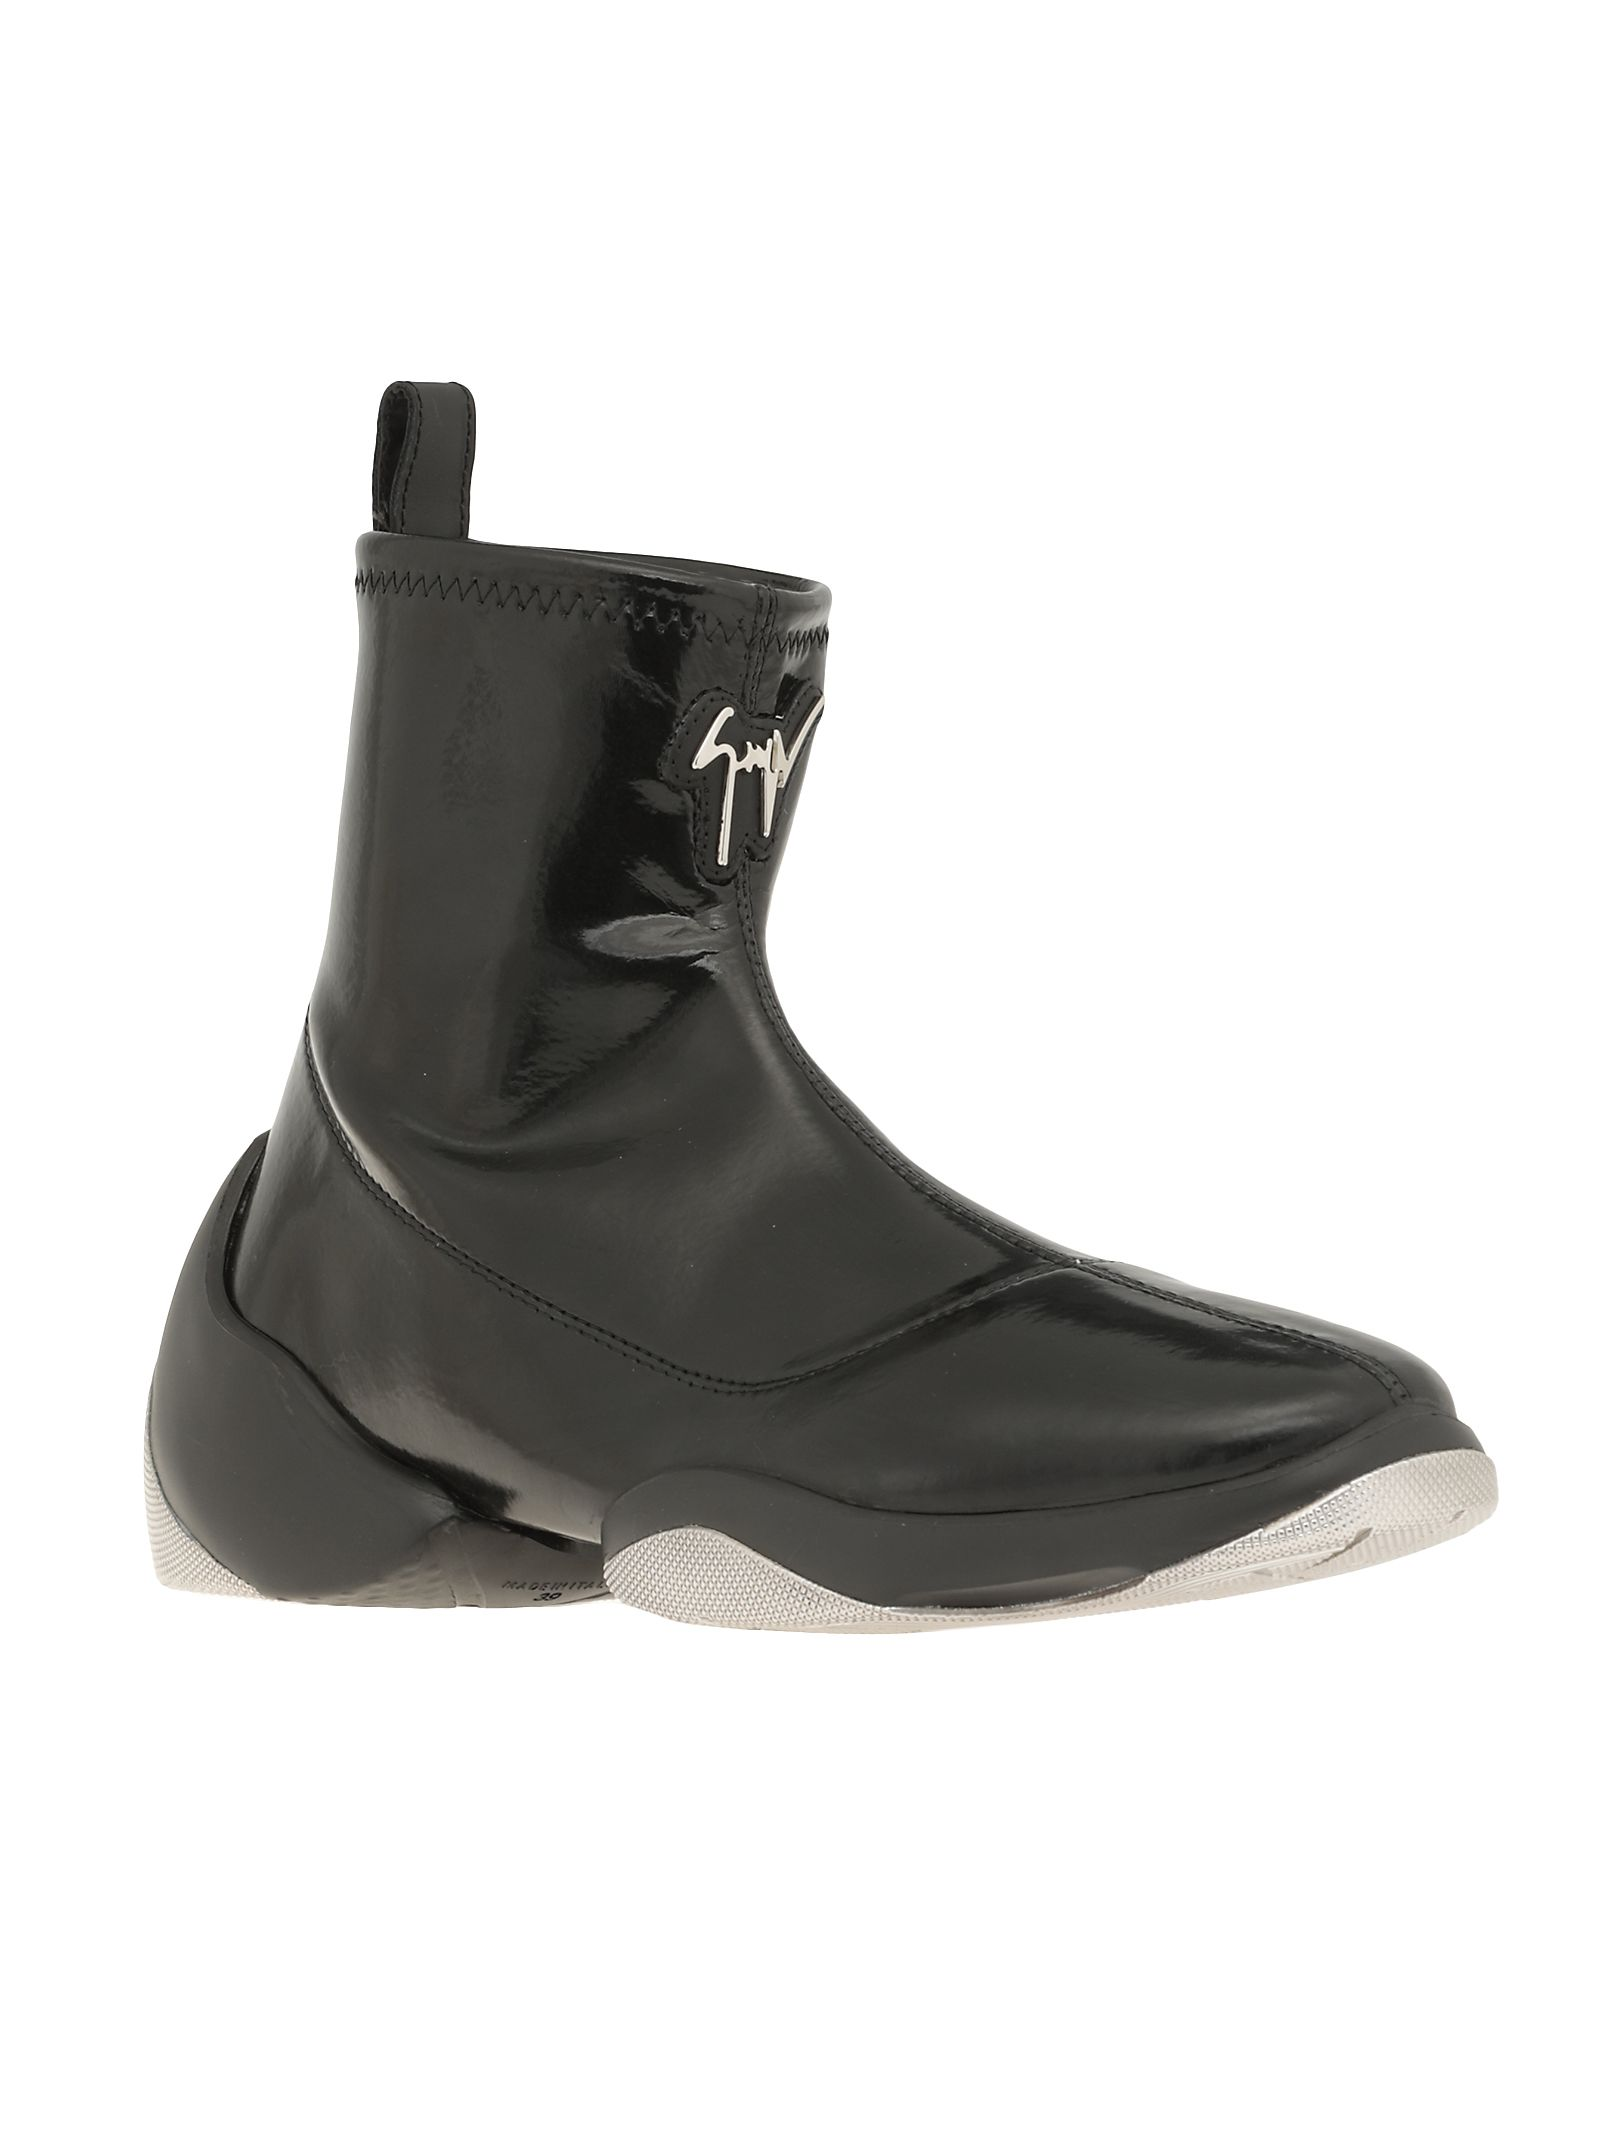 c94bc53d04f06 Giuseppe Zanotti Giuseppe Zanotti Light Jump Sneaker - Black ...